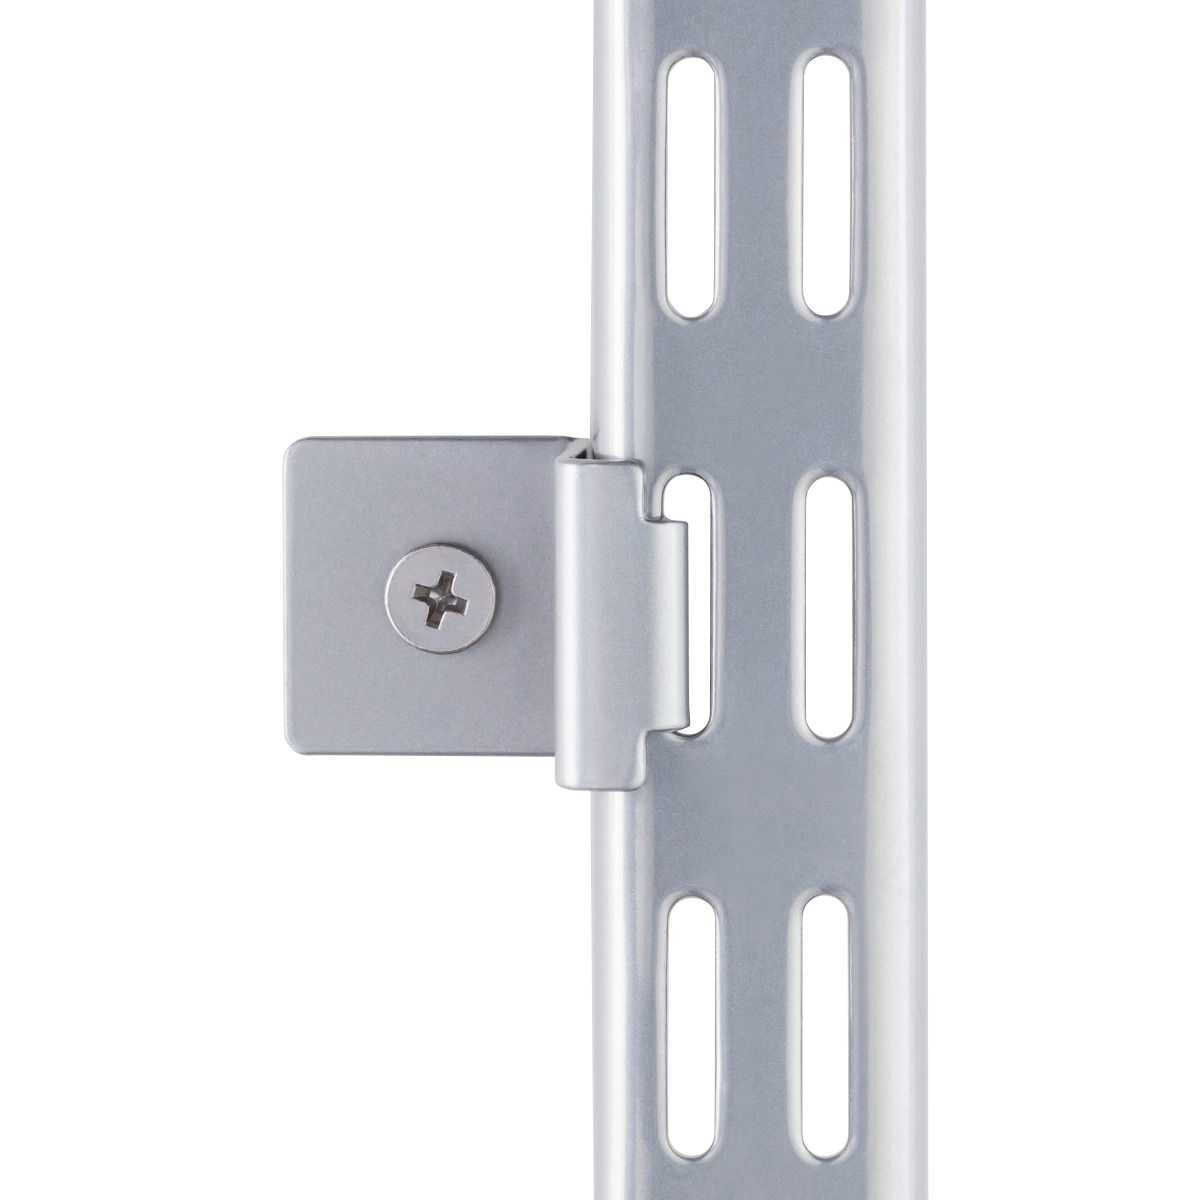 Platinum elfa Hang Standard Wall Clips